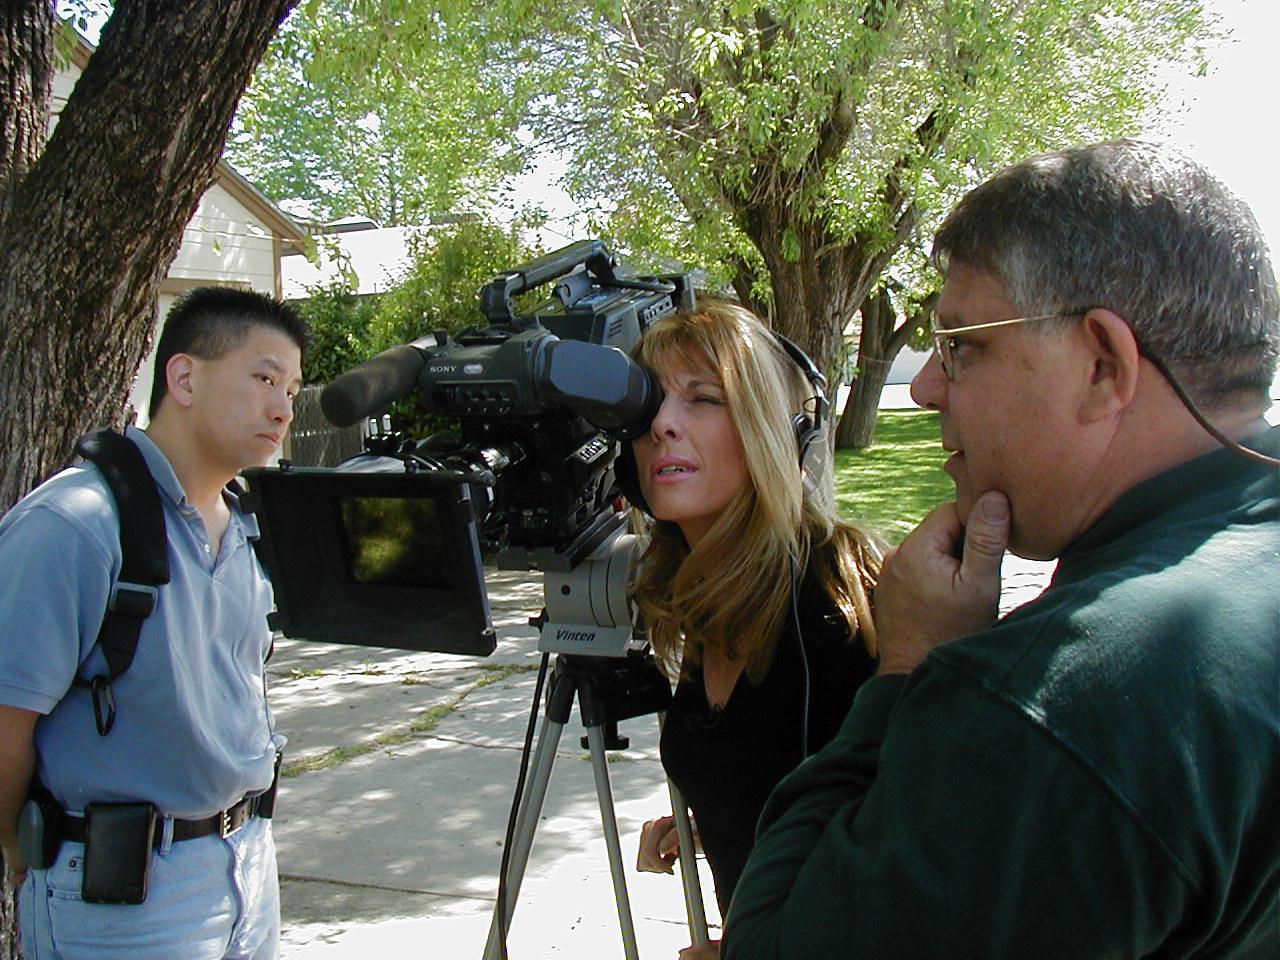 Shooting news package